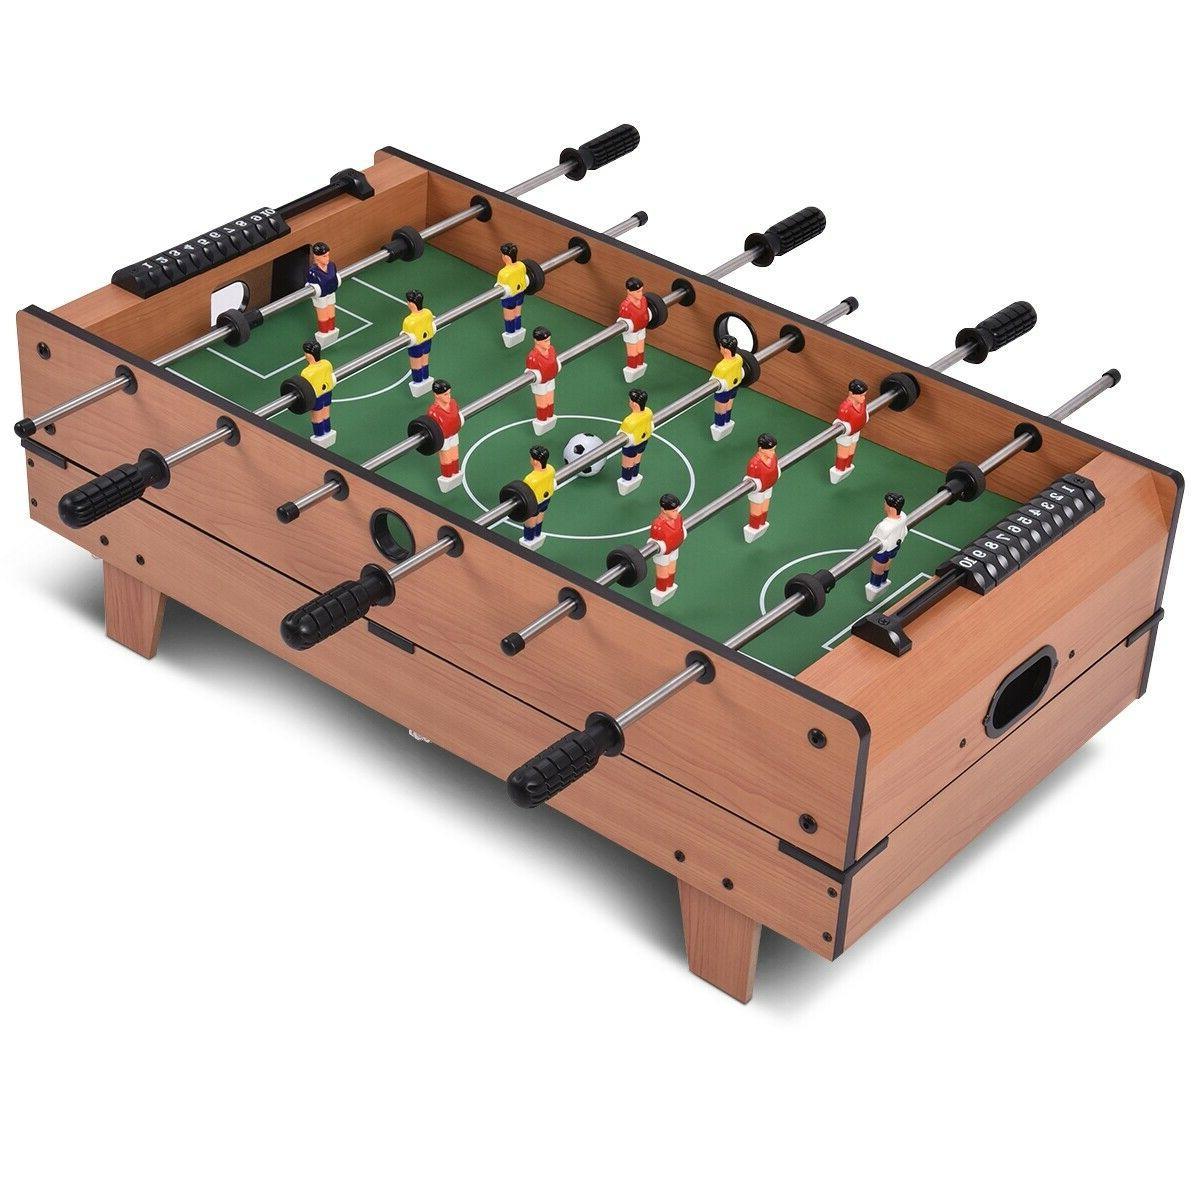 4 1 Game Table Set Billiards/Pool, Foosball, Tennis